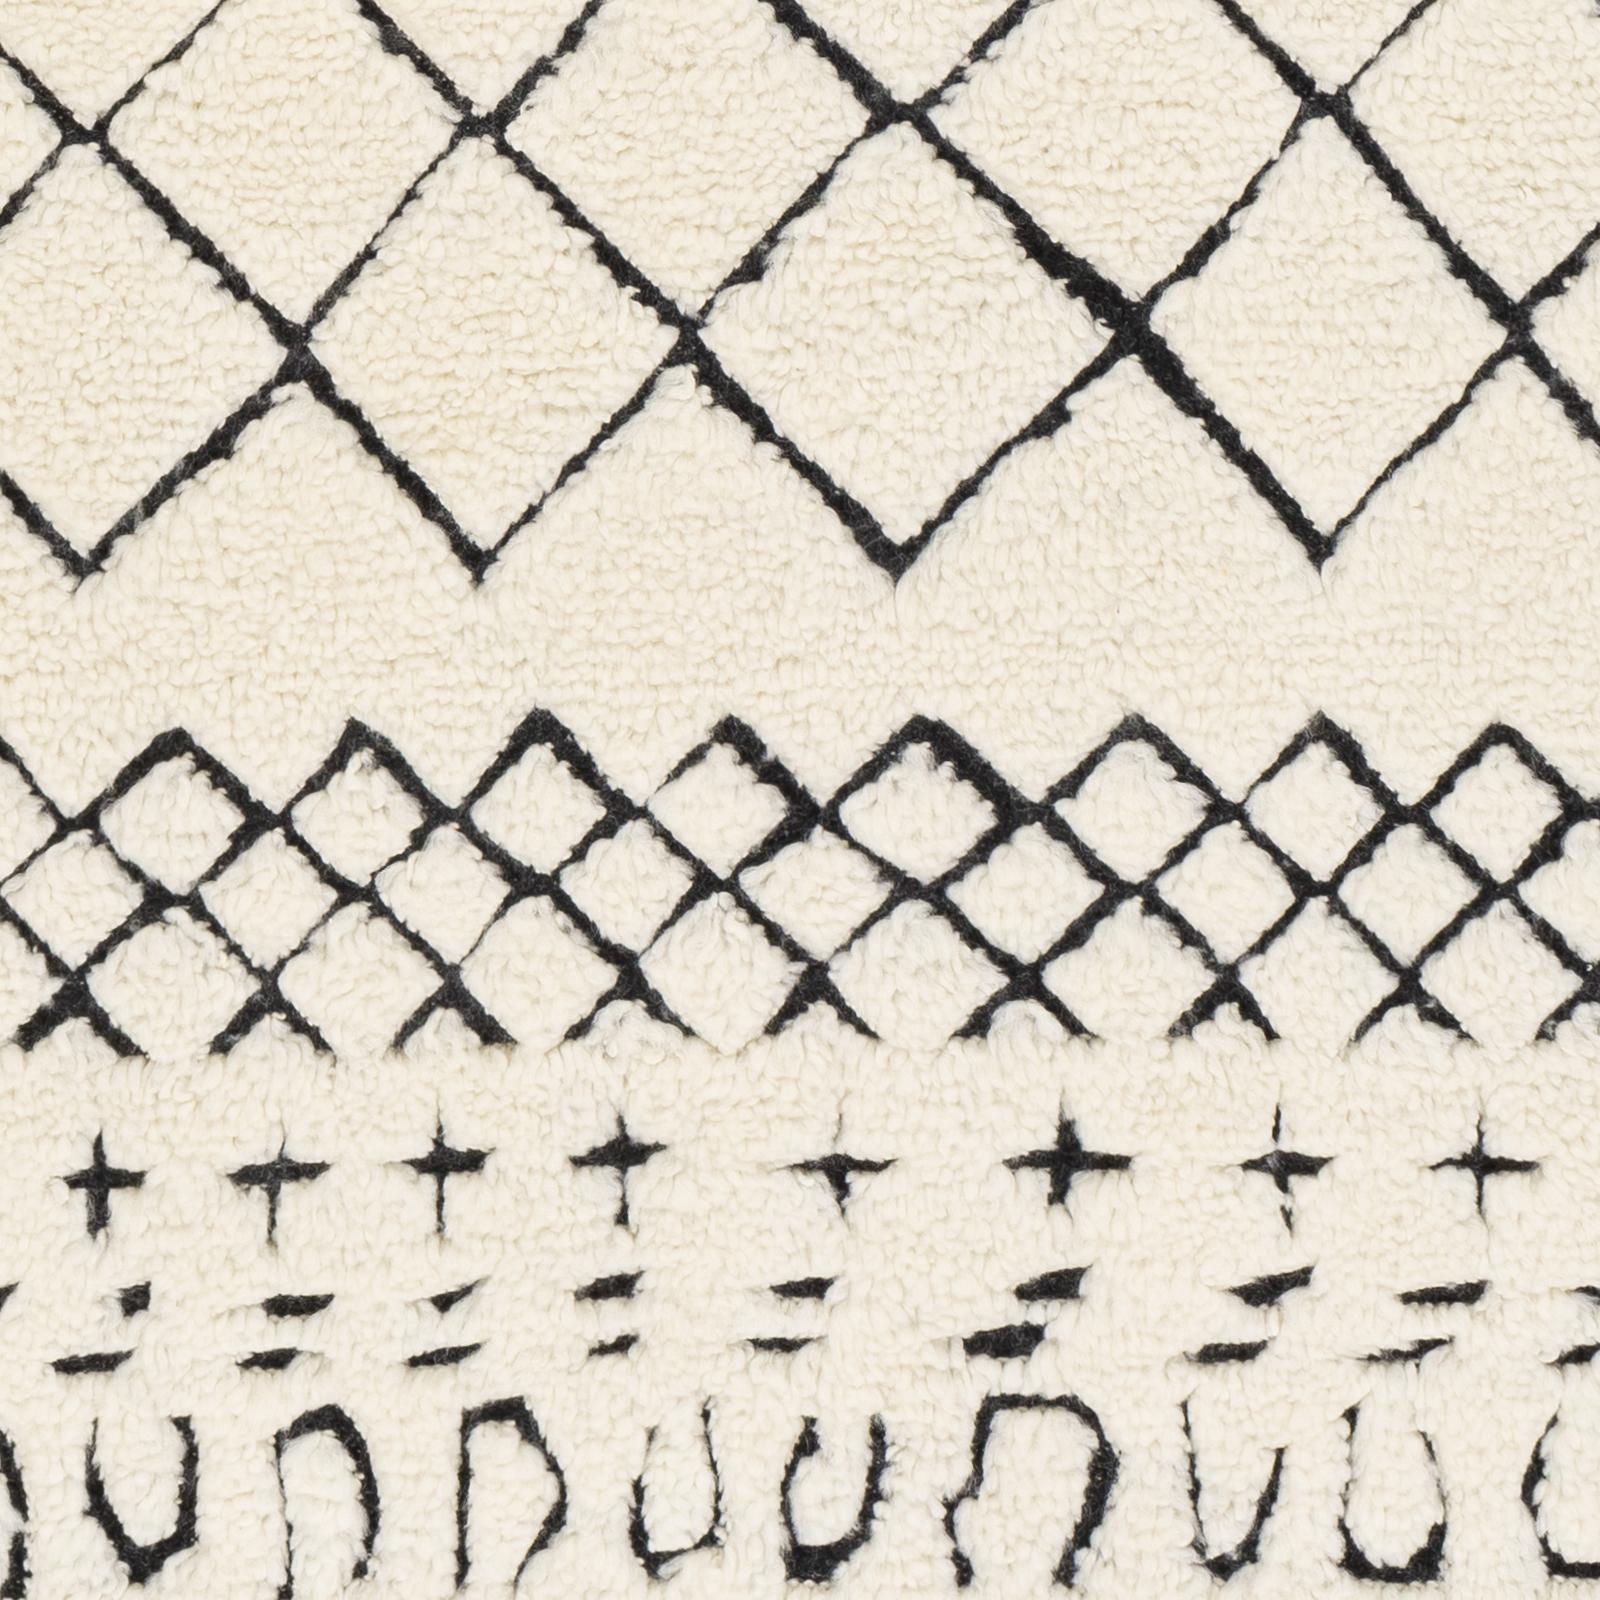 Meknes - MEK-1003 - 2' x 3'